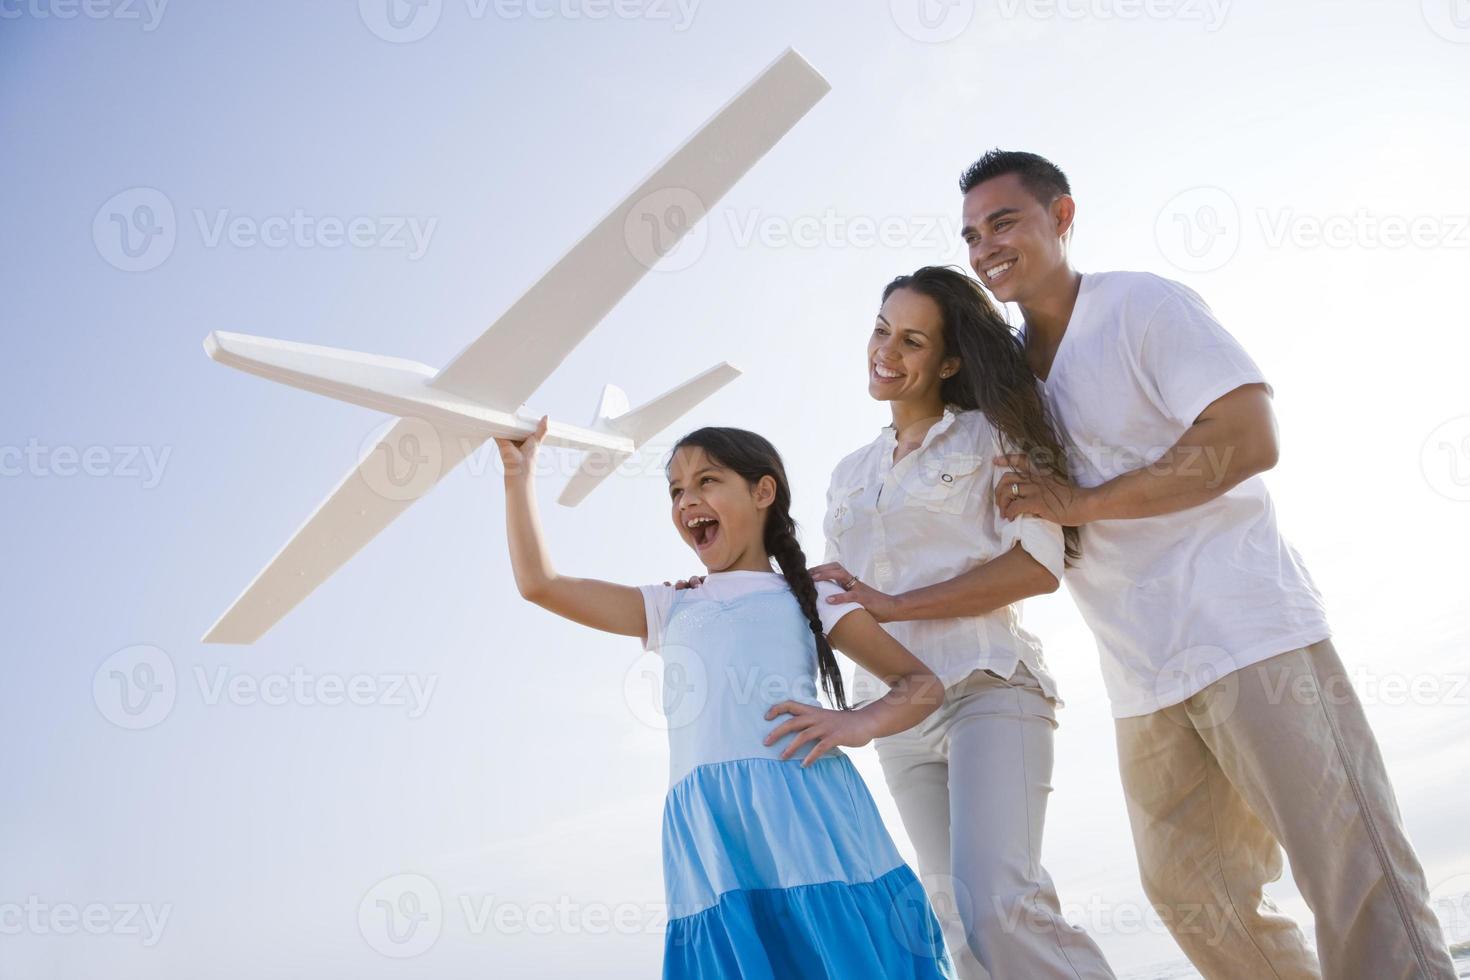 Hispanic family and girl having fun with toy plane photo